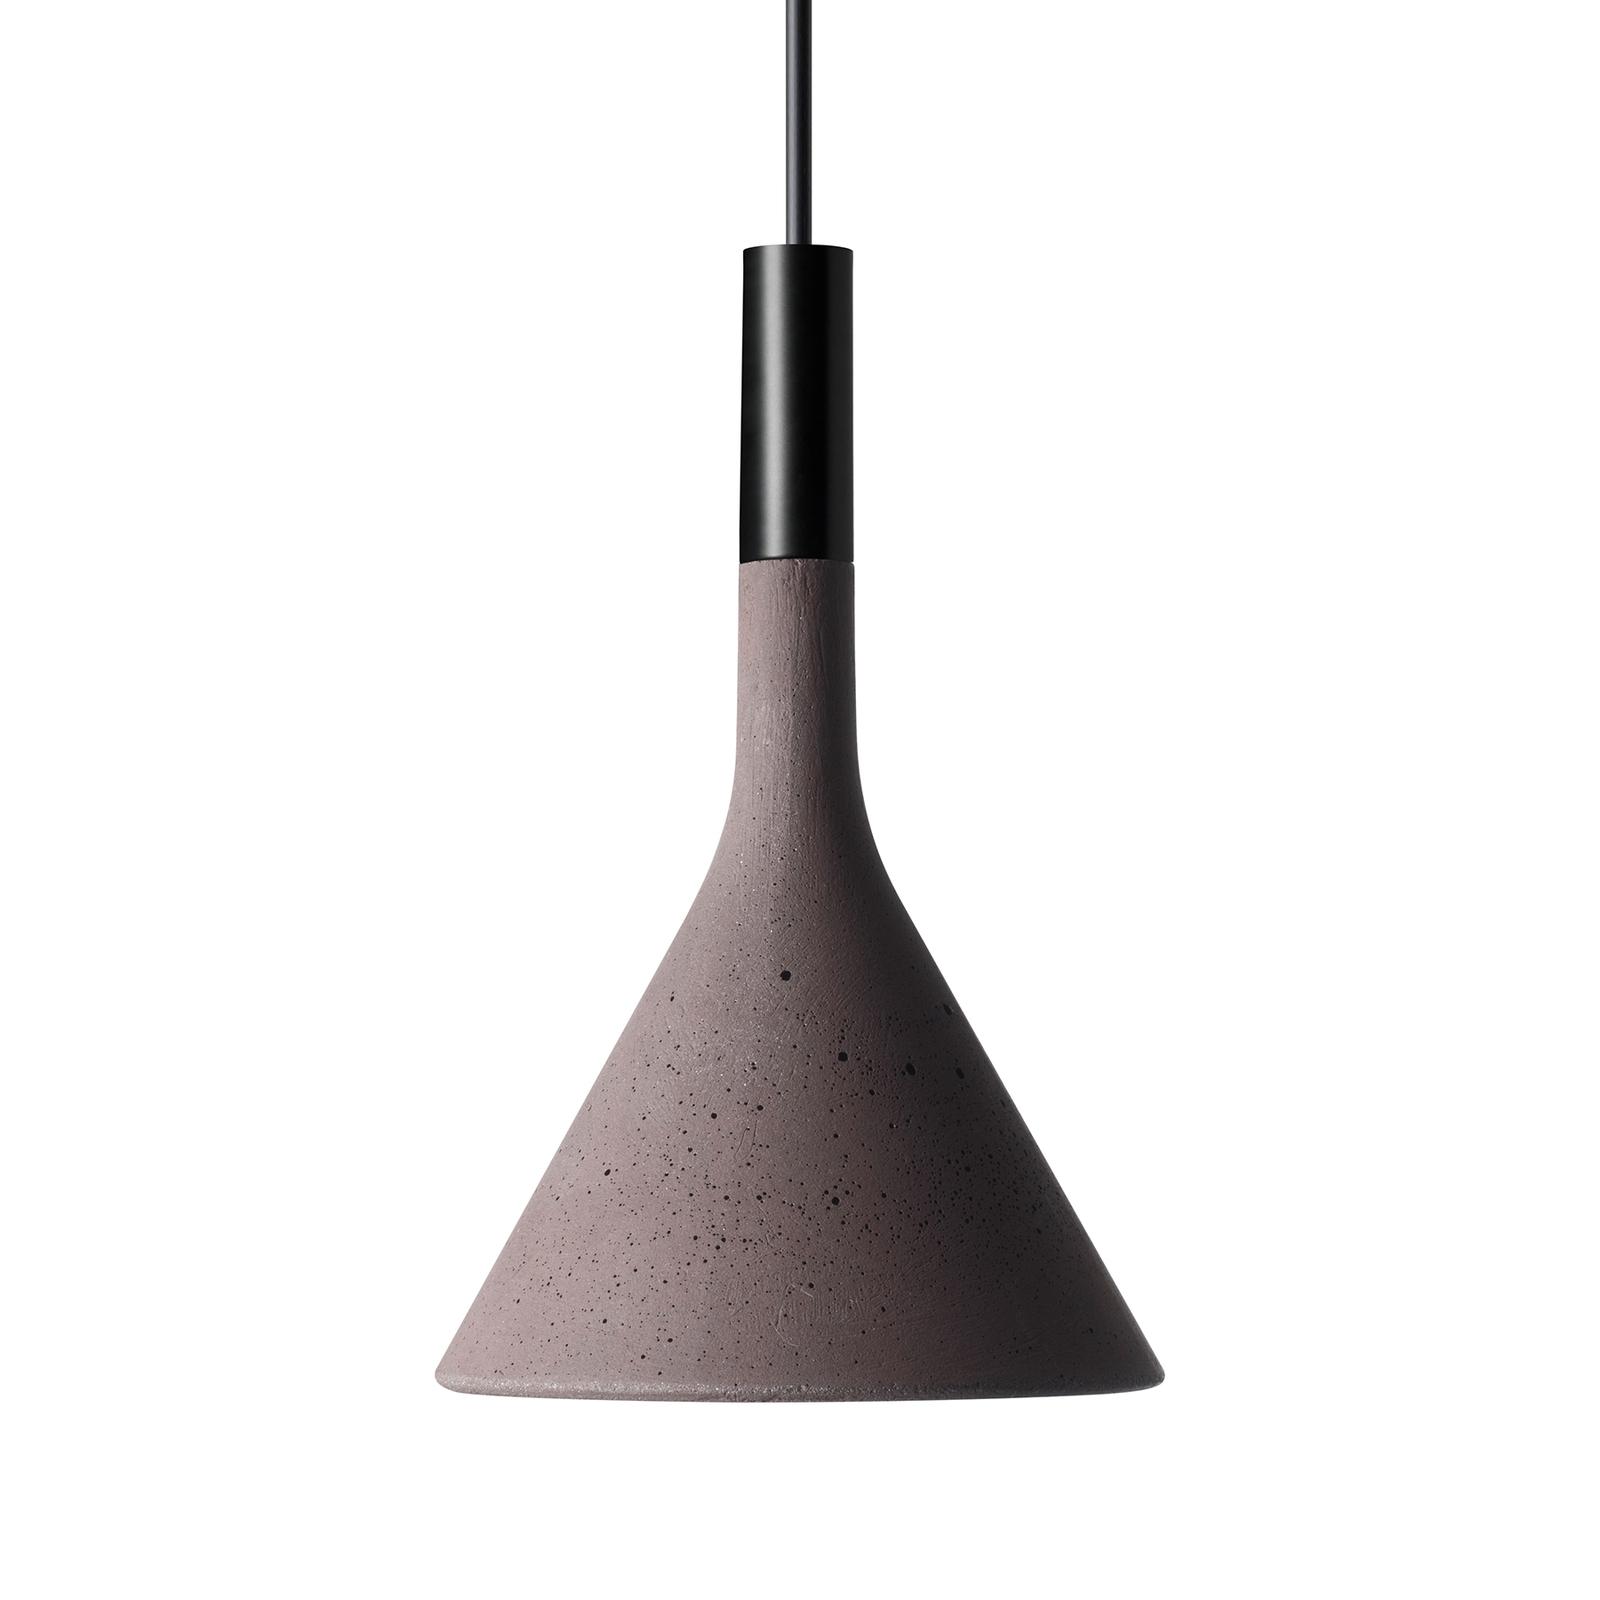 Foscarini Aplomb Mini hänglampa i betong, brun